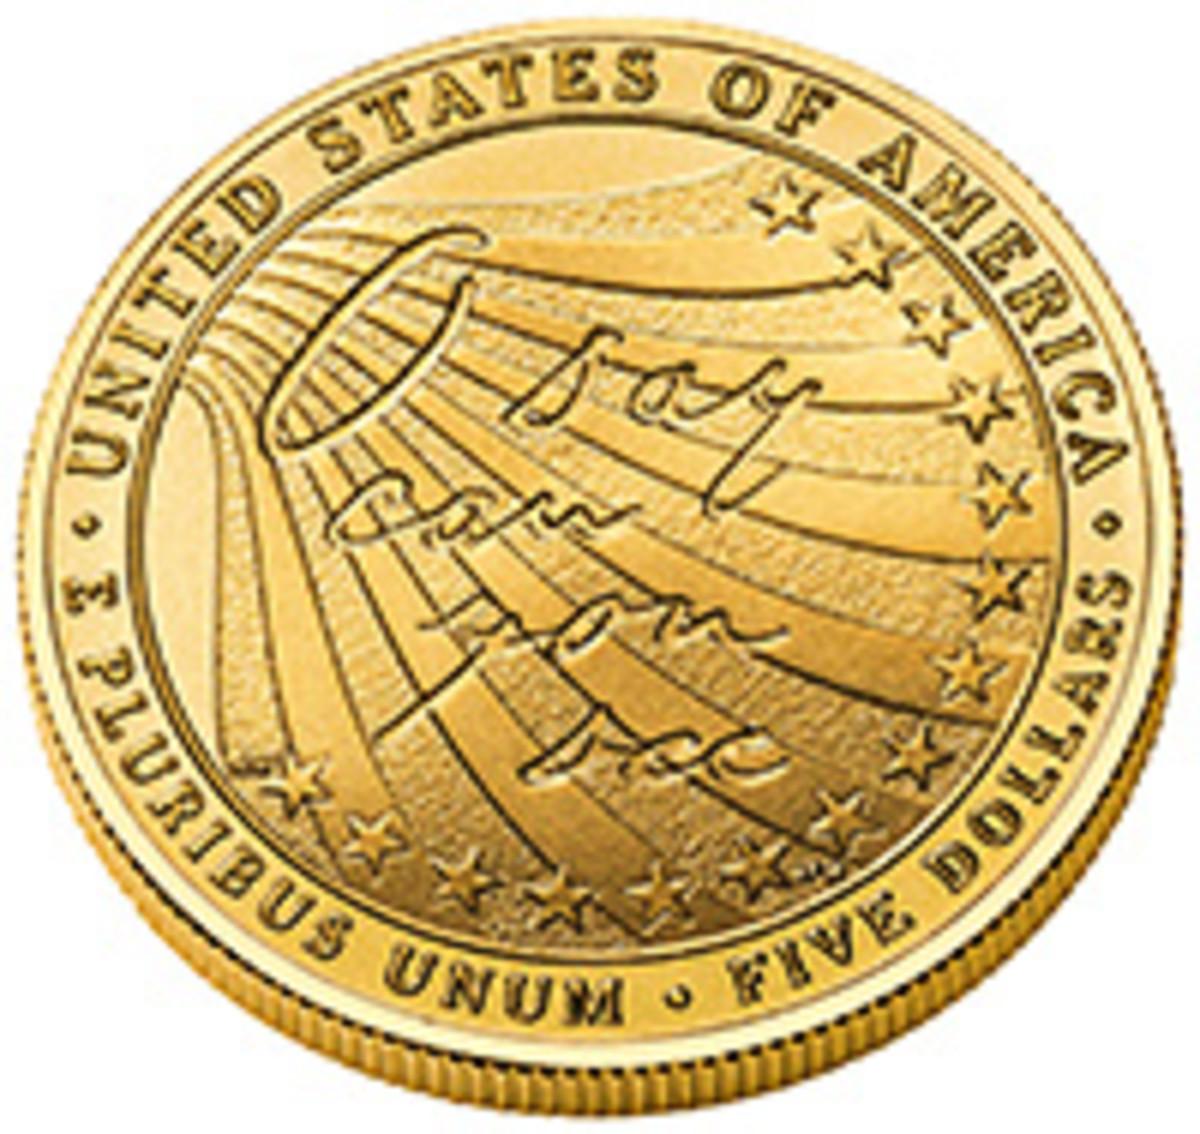 SS2_2012-SSB-gold-unc-rev_200